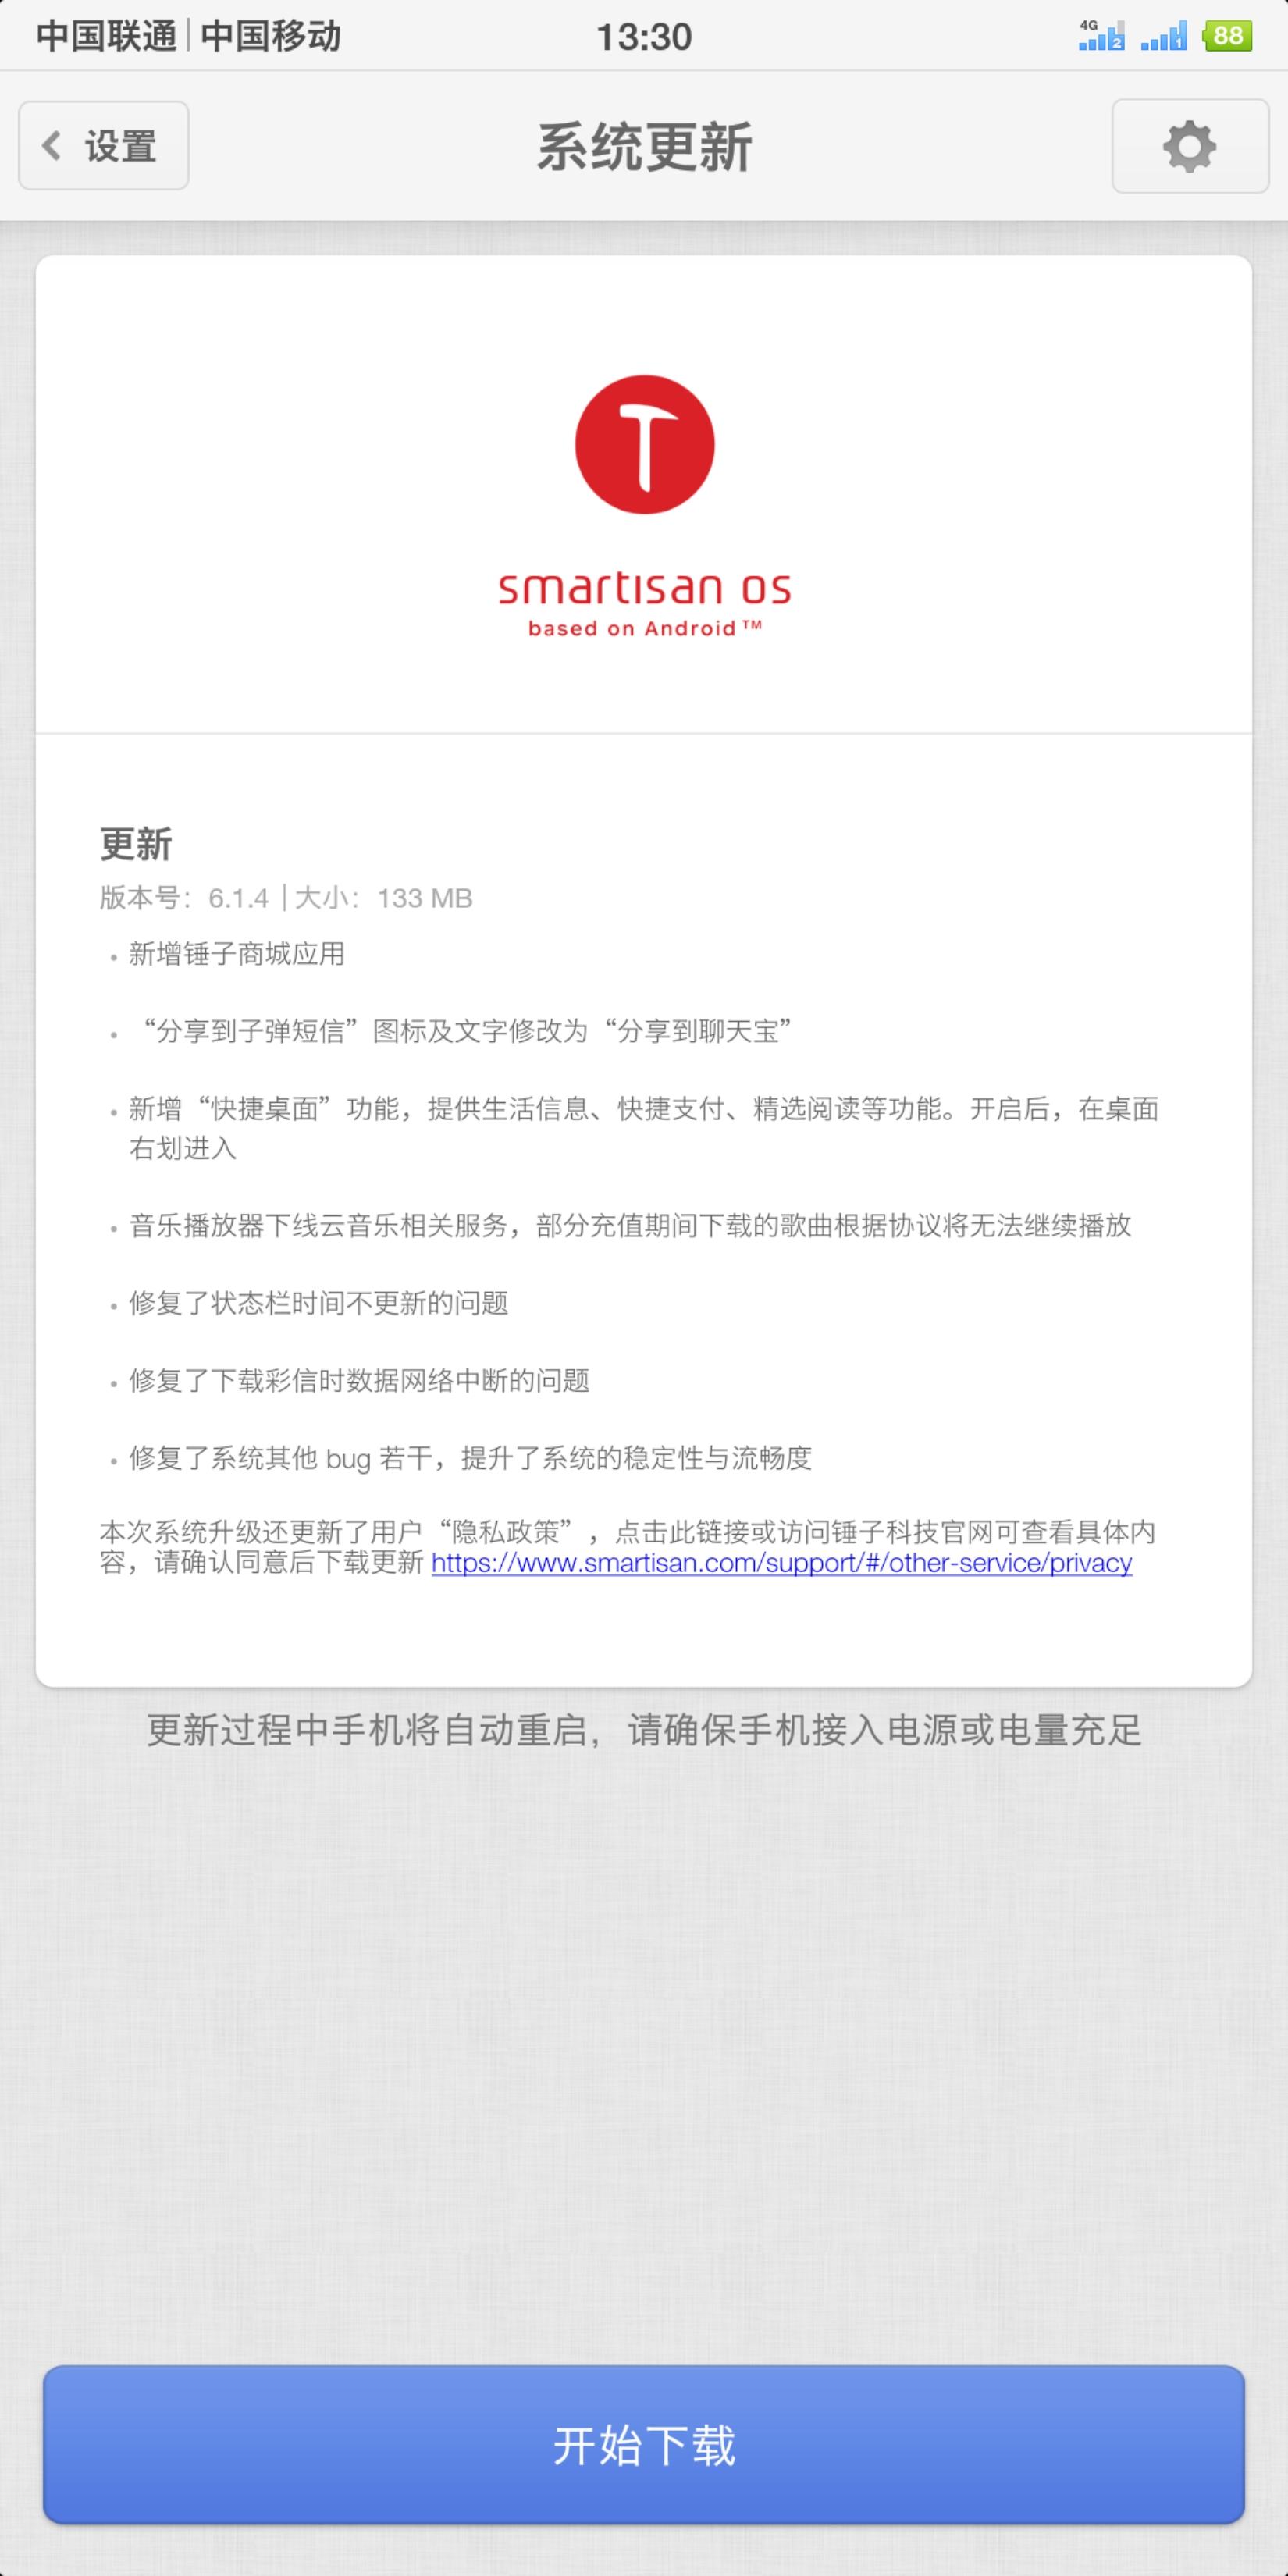 Screenshot_2019-03-14-13-30-22-568_??.png